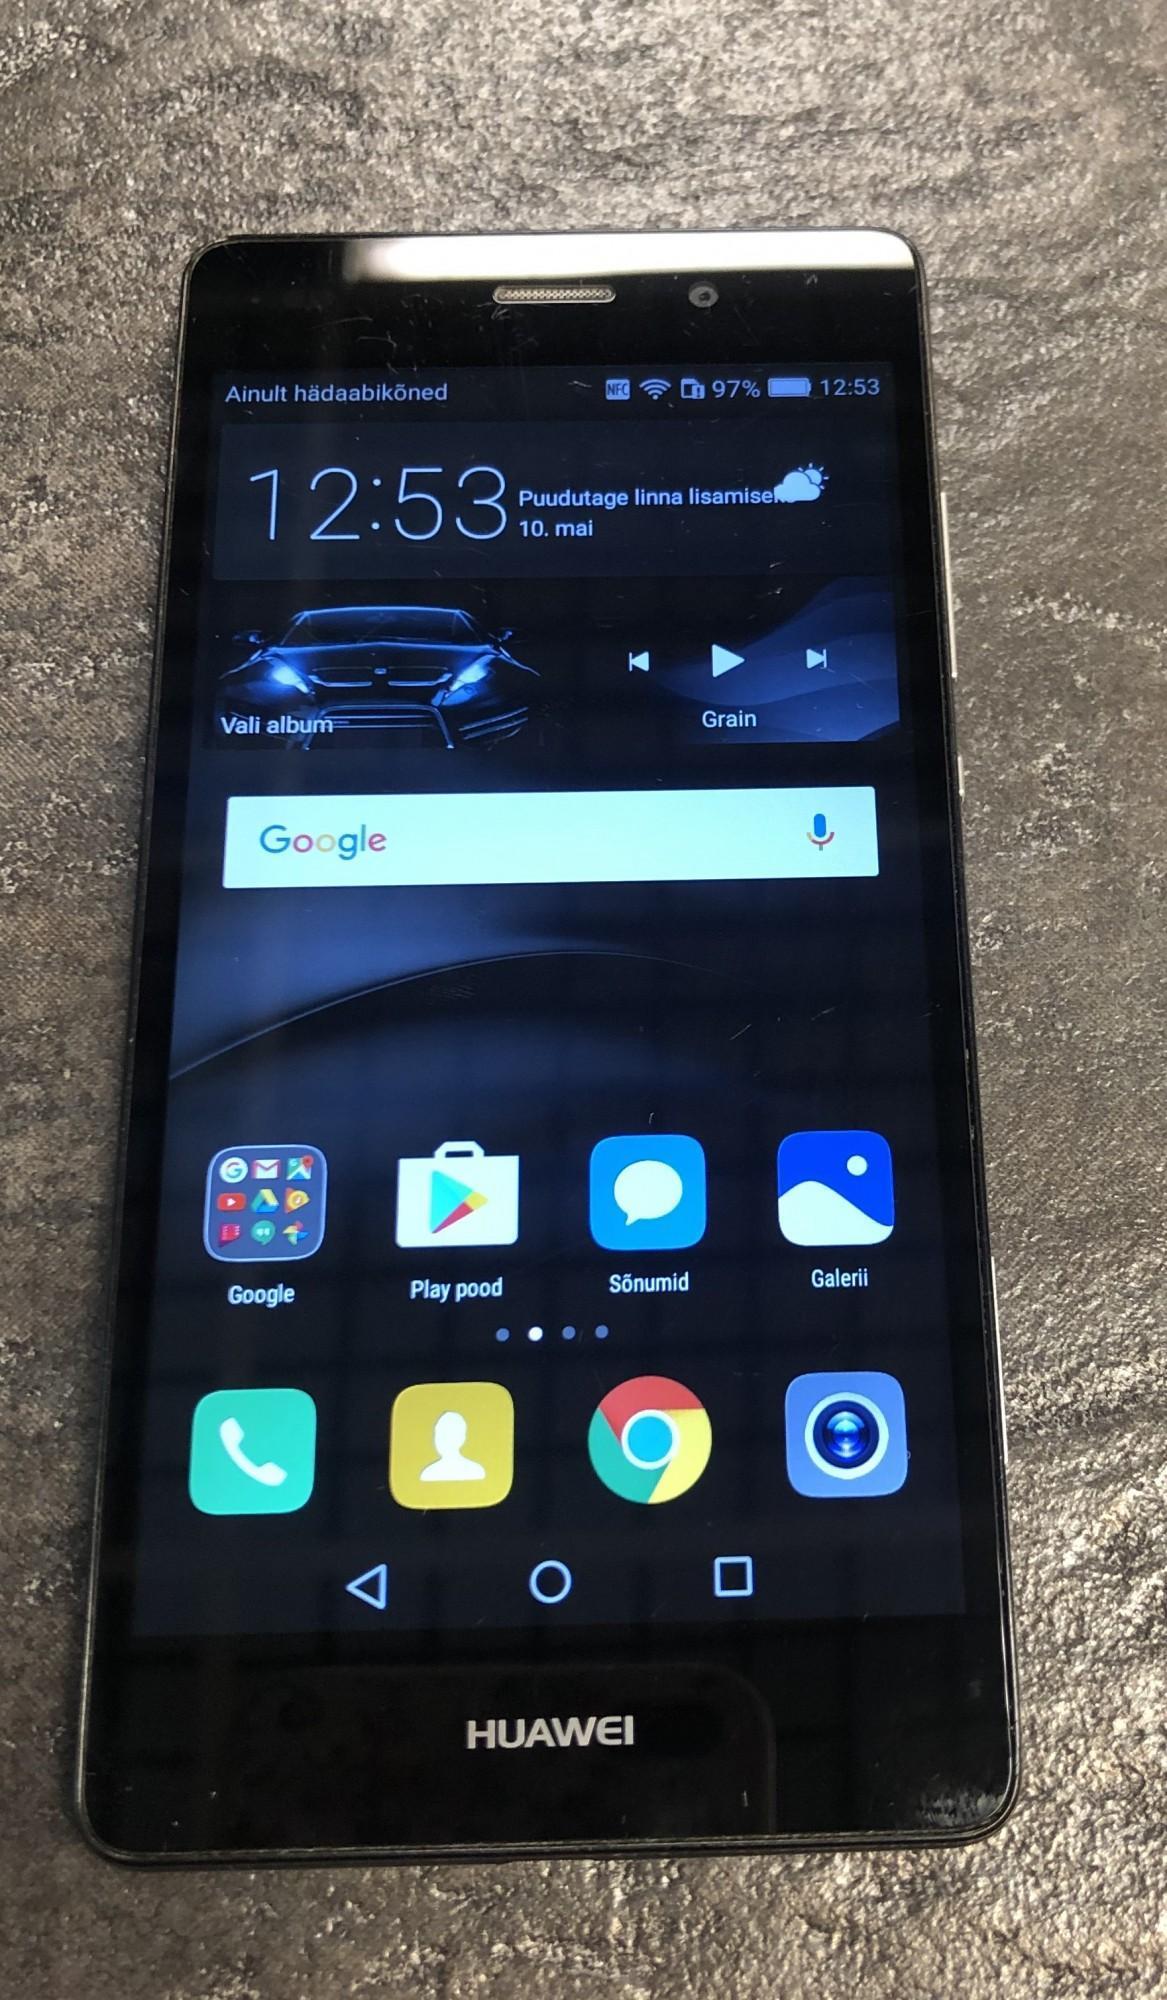 2a3e9c69ceb Mobiiltelefonid Huawei P8 Lite - Luutar